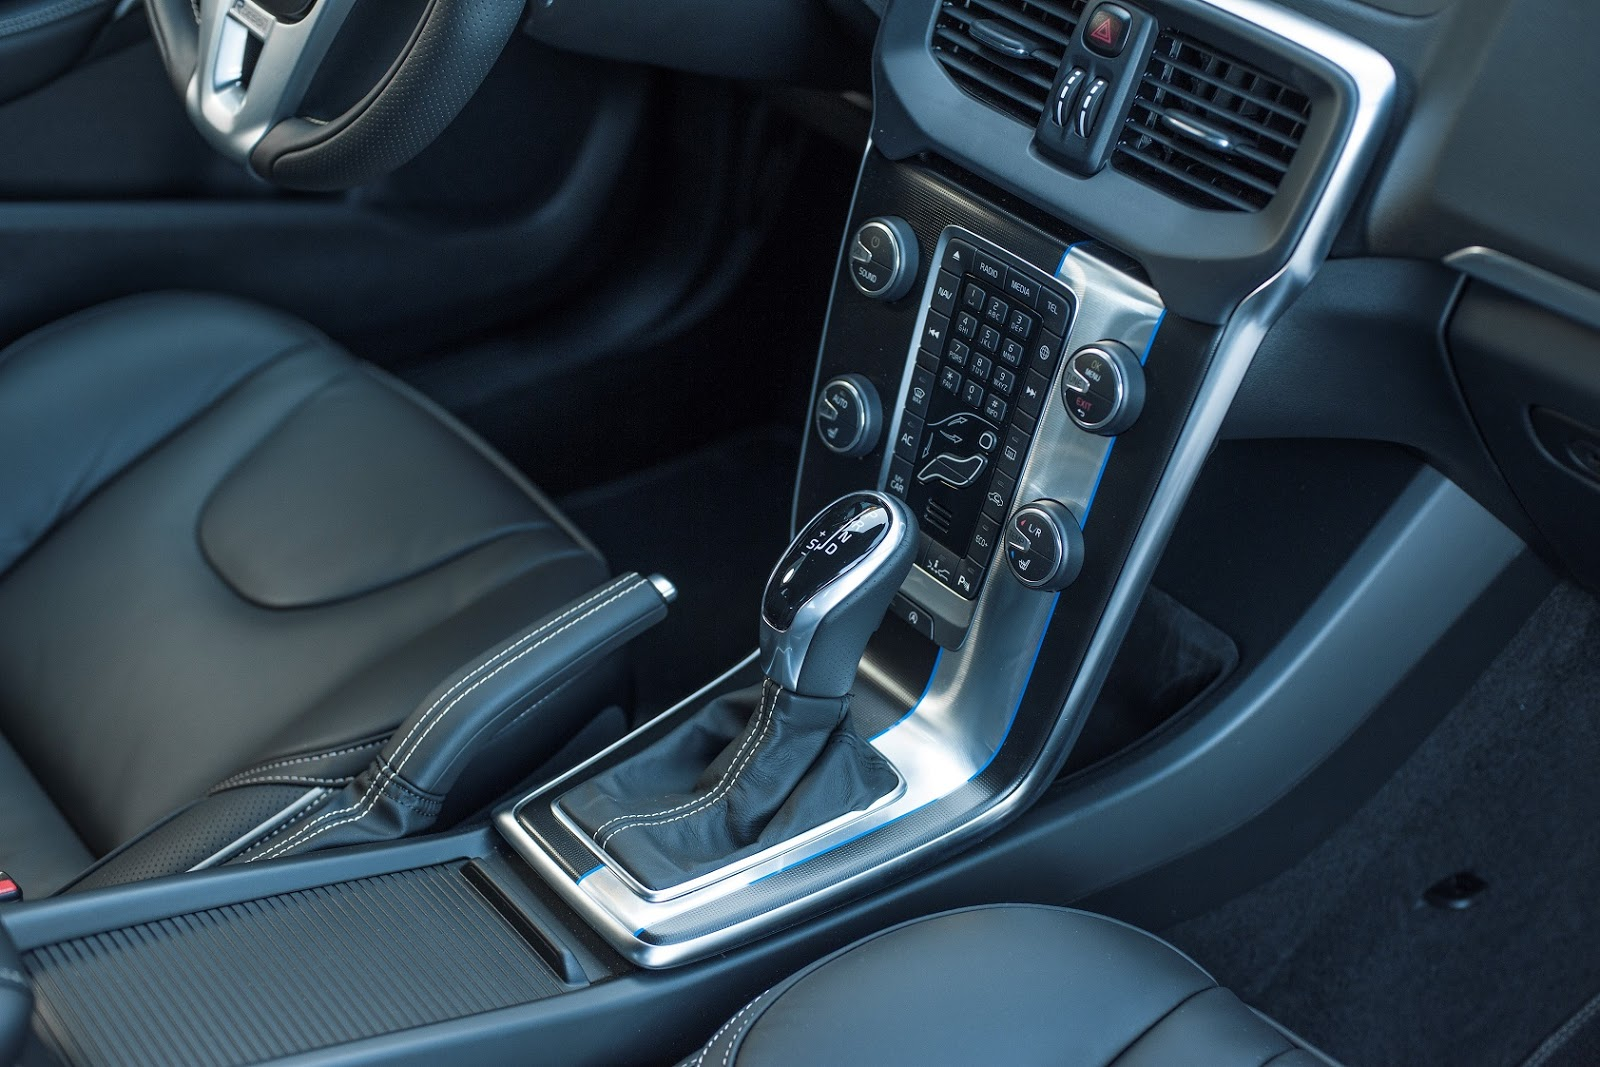 V40%2B%2526%2BV40%2BCROSS%2BCOUNTRY%2B1.5%2BT3%2BAUTO Το Volvo V40 Cross Country με το νέο κινητήρα 1,5 λίτρων, απόδοσης 152 ίππων από 21.900 €